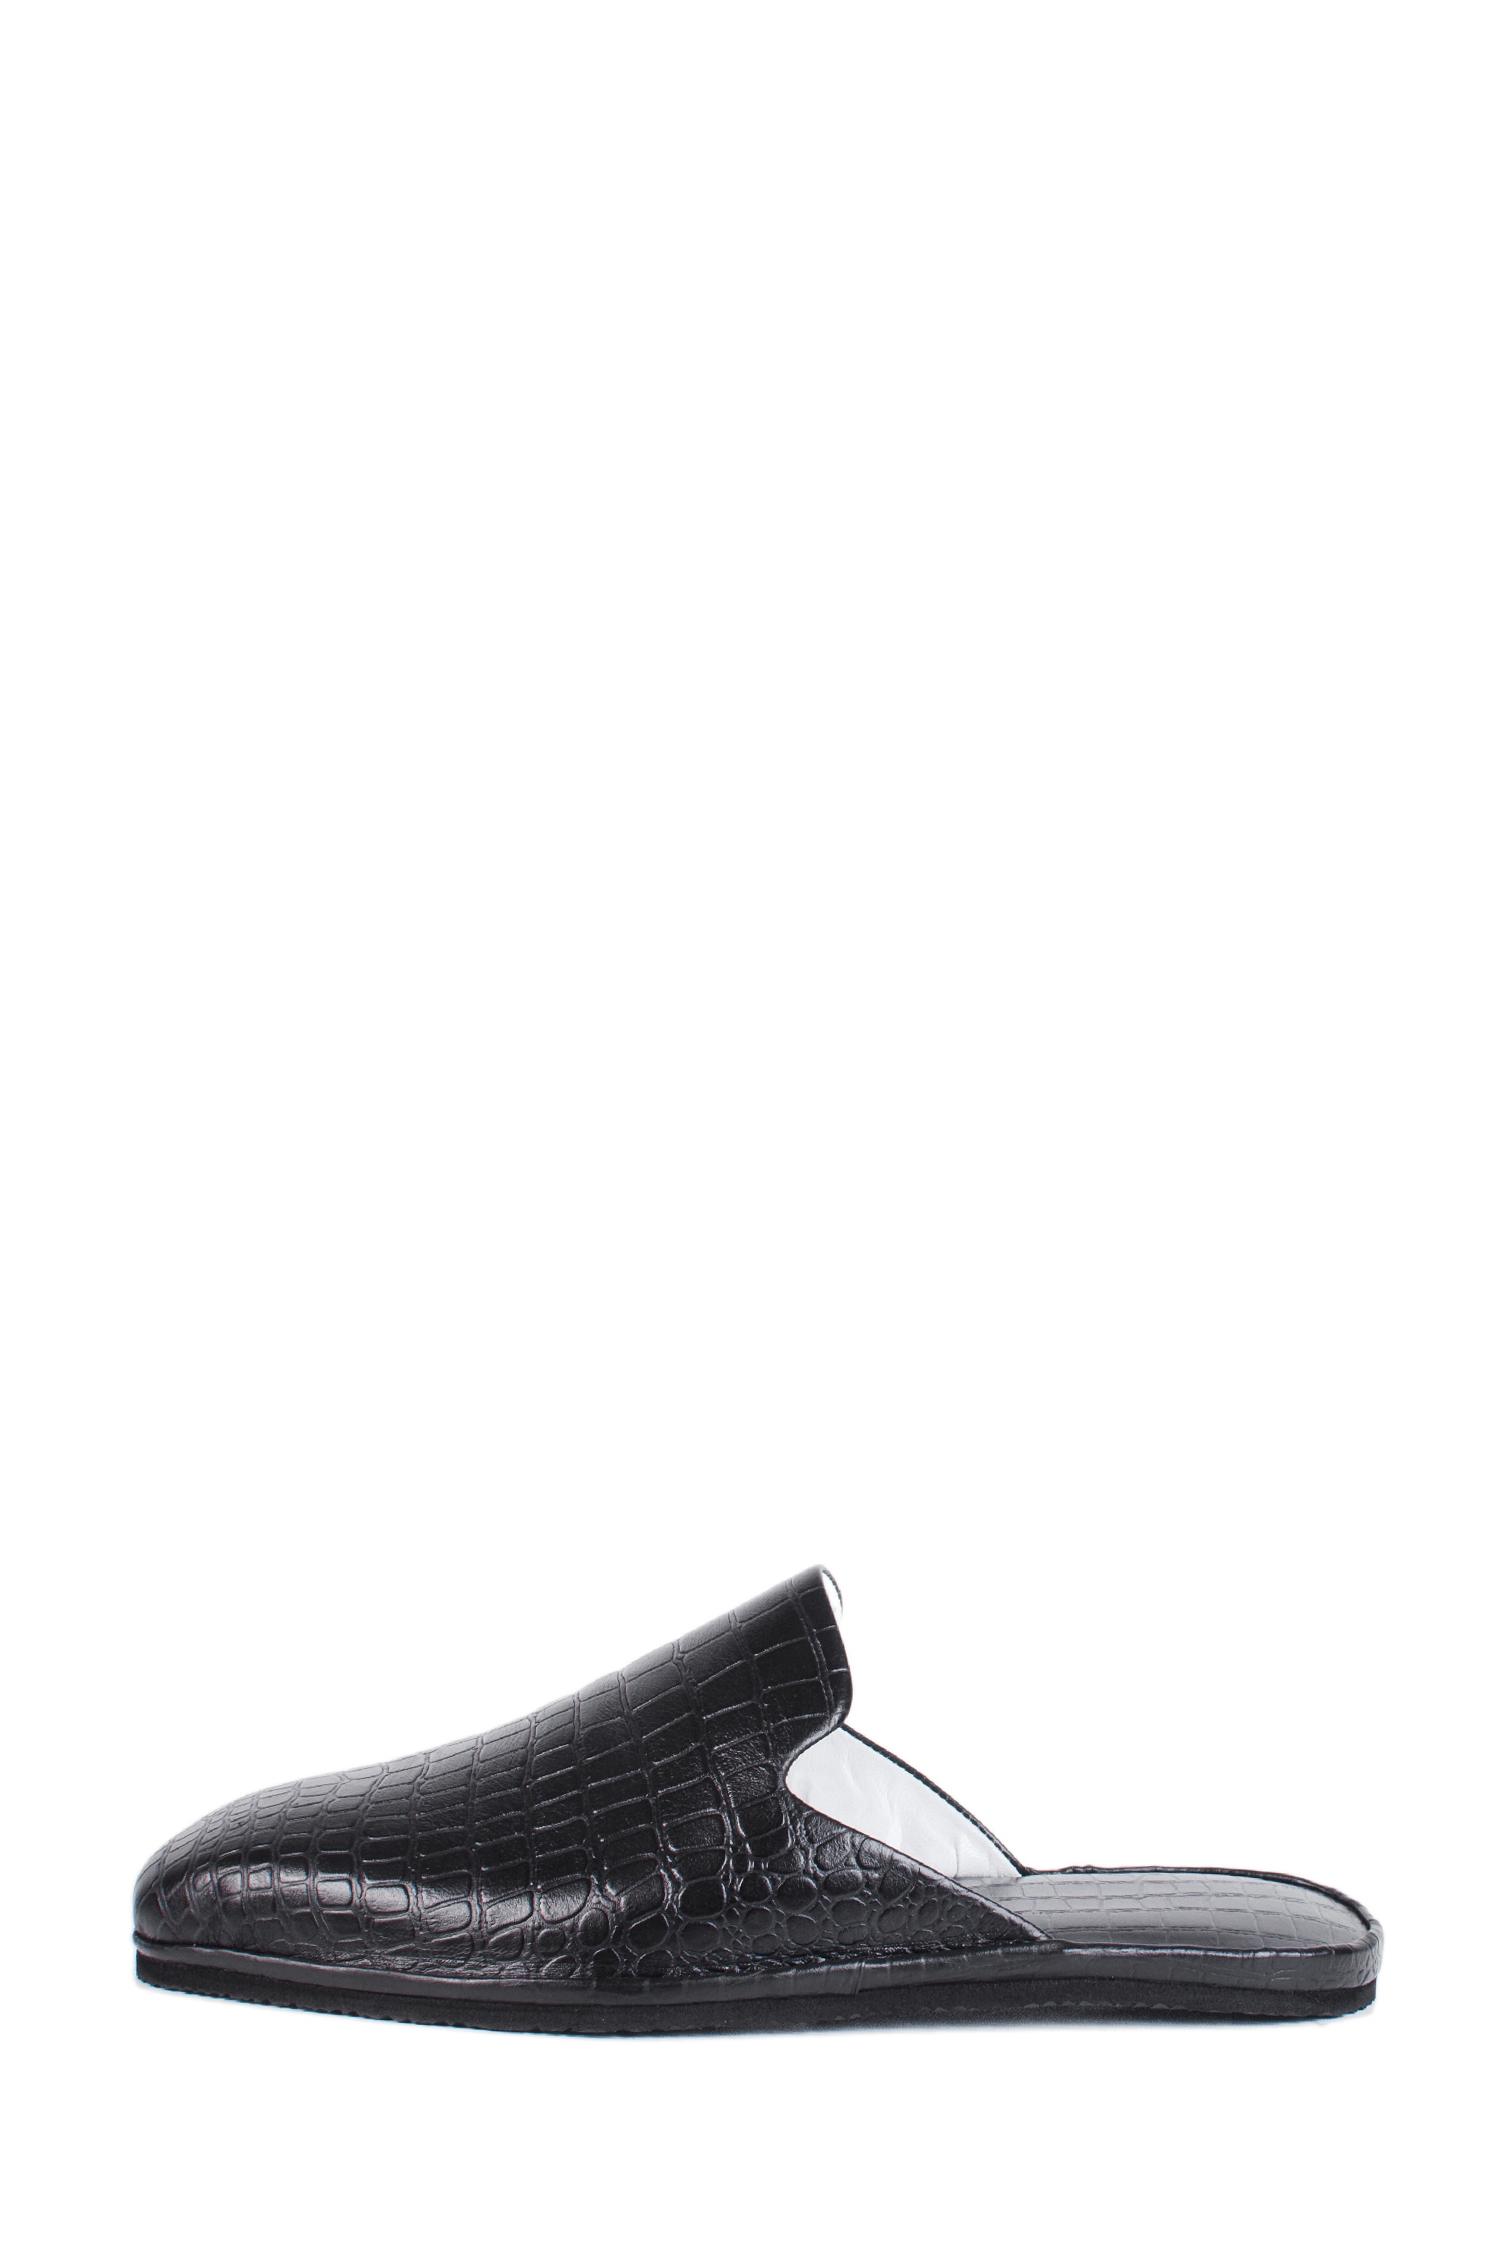 Обувь домашняя мужская